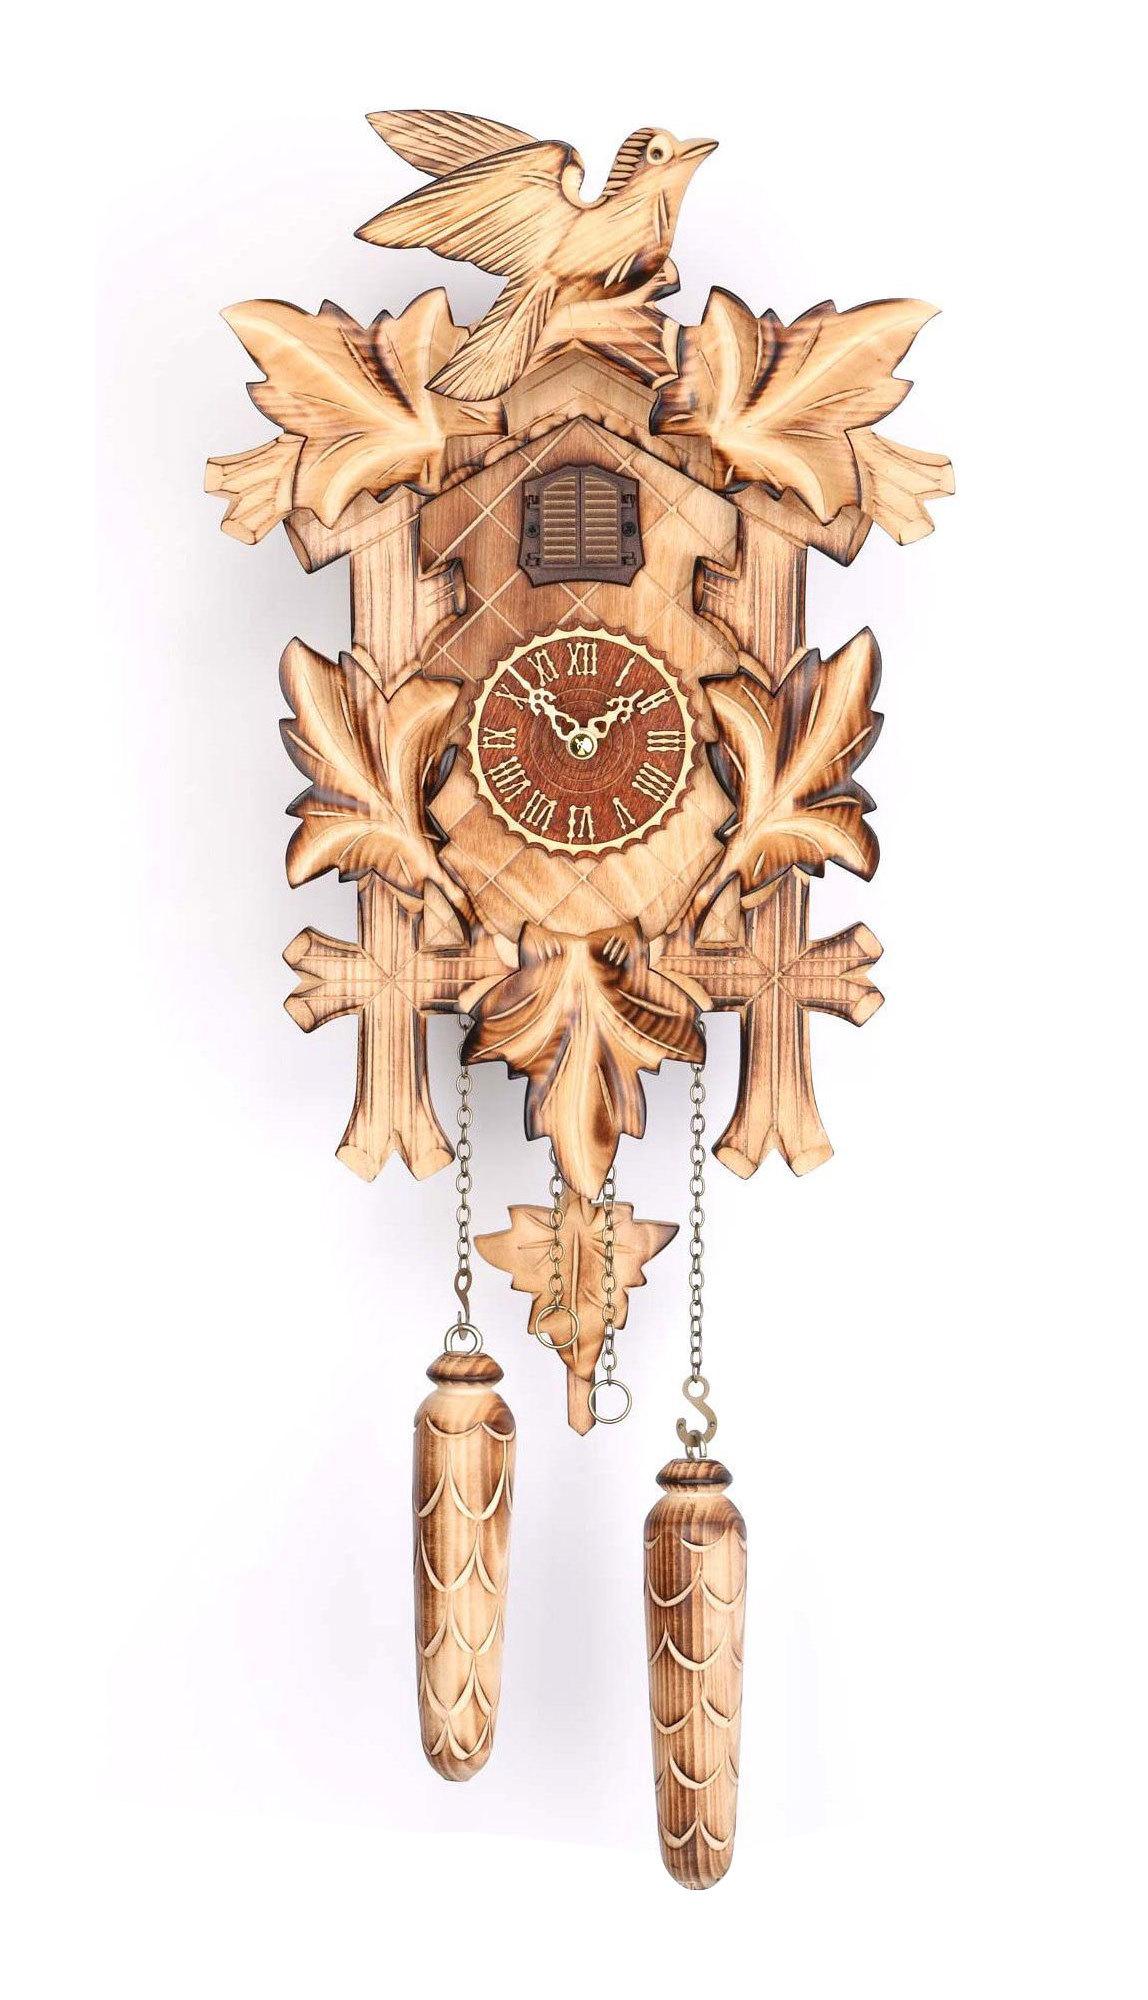 Часы настенные Часы настенные с кукушкой Trenkle 374 QM HZZG chasy-nastennye-s-kukushkoy-trenkle-374-qm-hzzg-germaniya.jpg